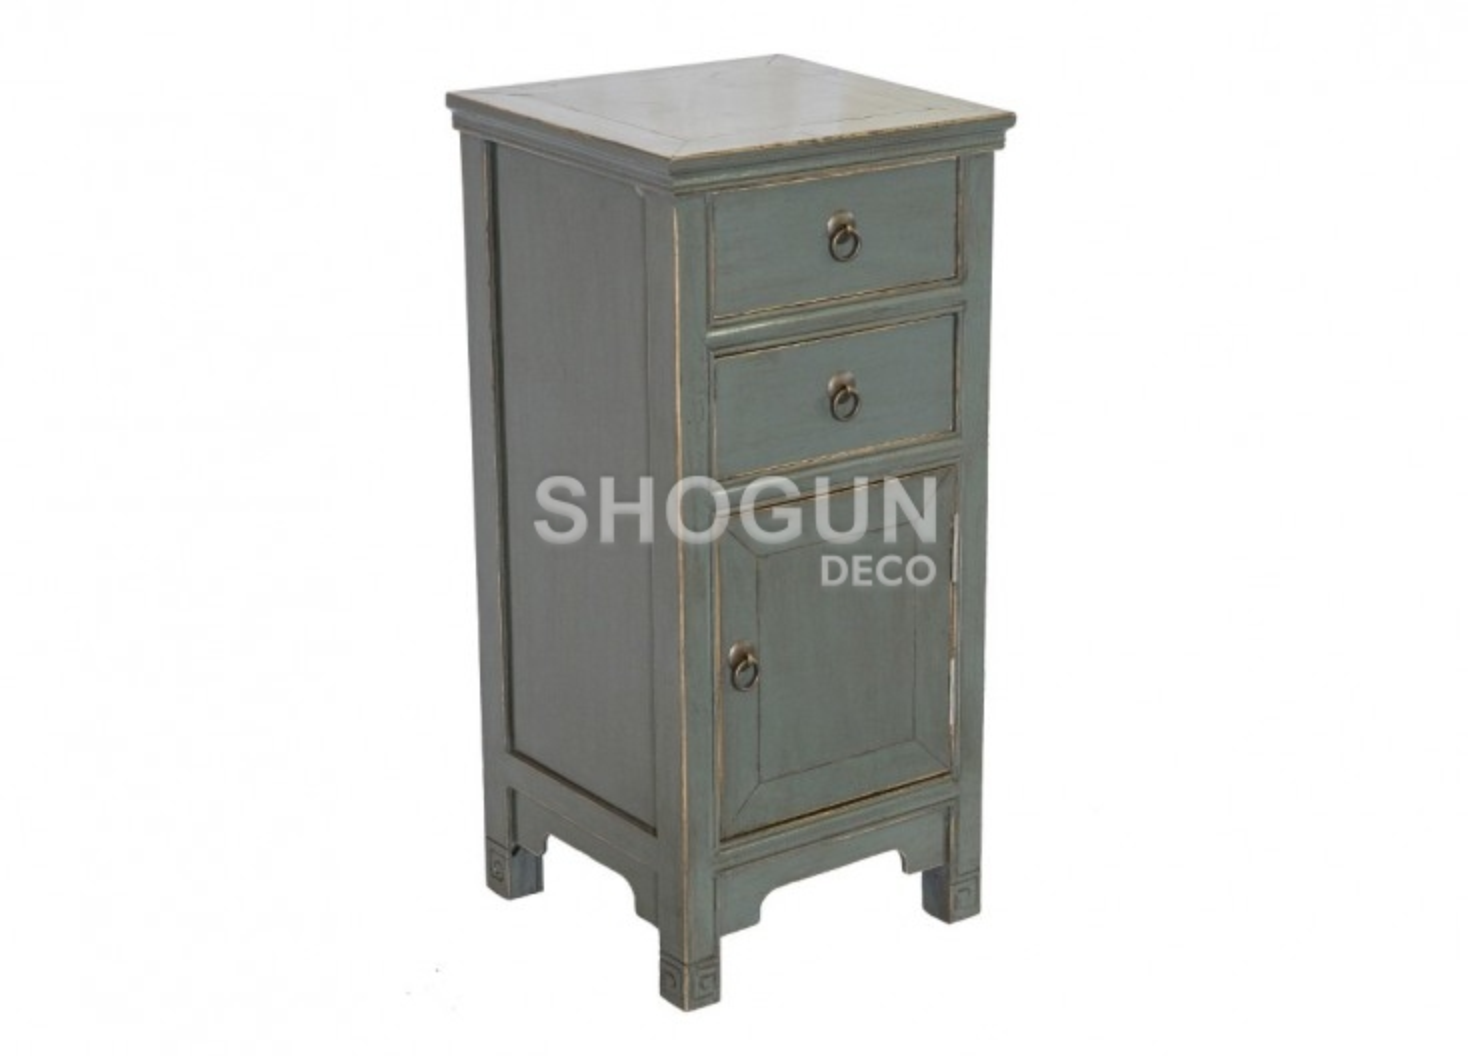 Meuble d'appoint Chinois - 1 porte 2 tiroirs - Vert d'eau